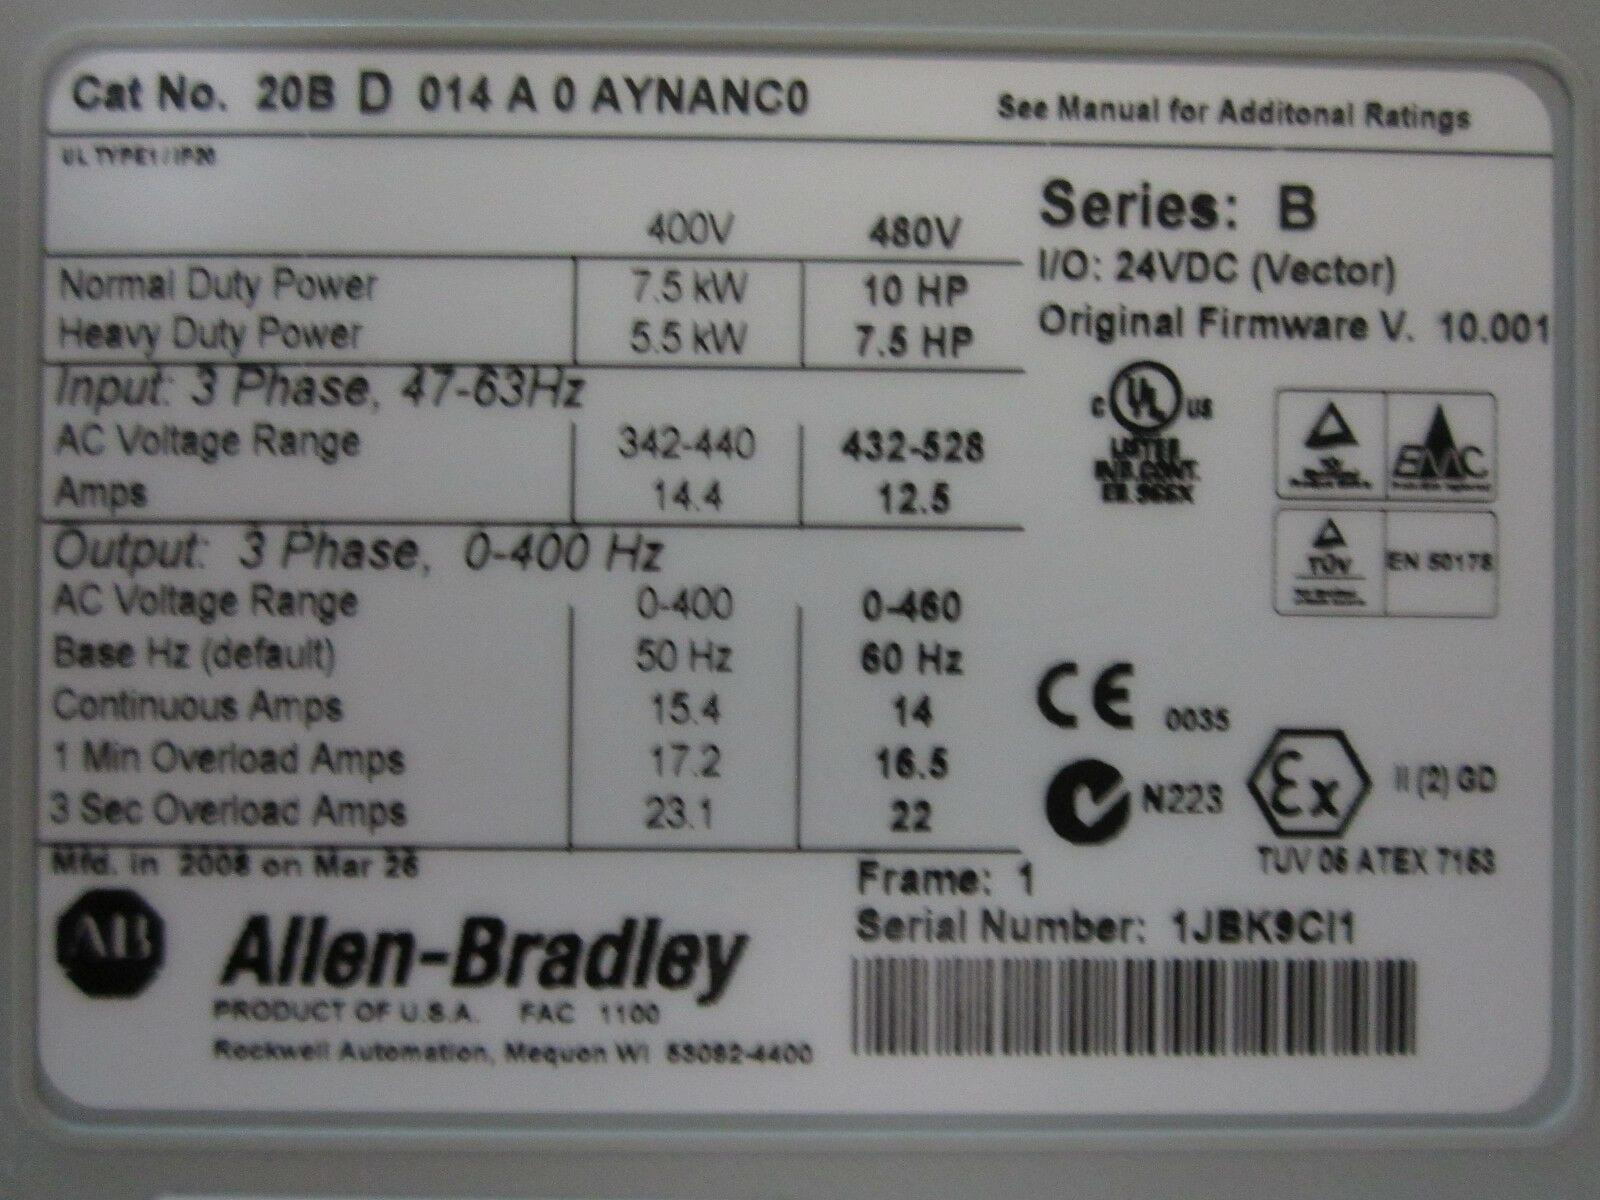 Allen Bradley 20BD014A0AYNANC0 PowerFlex 700 AC Drive 7 5KW/10HP *Never  Used*